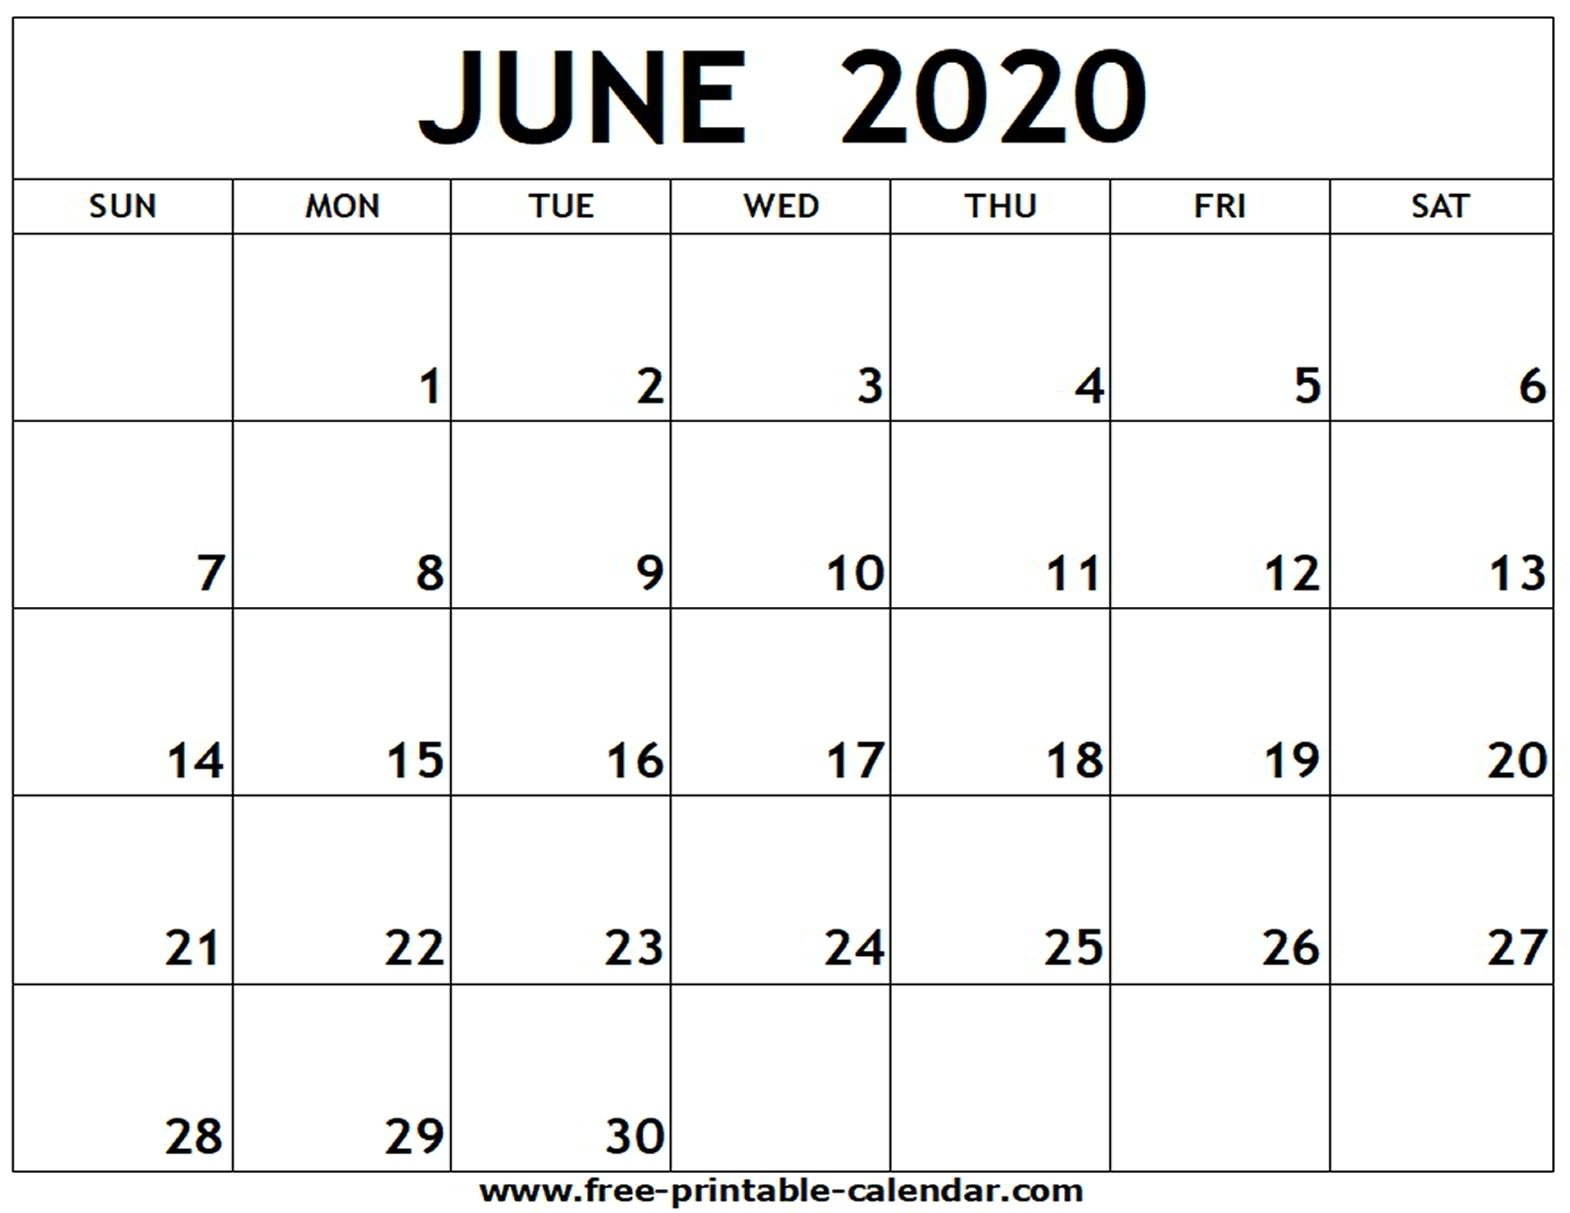 2020 Printable Fill In Calendar - Calendar Inspiration Design How To Fill June Calendar